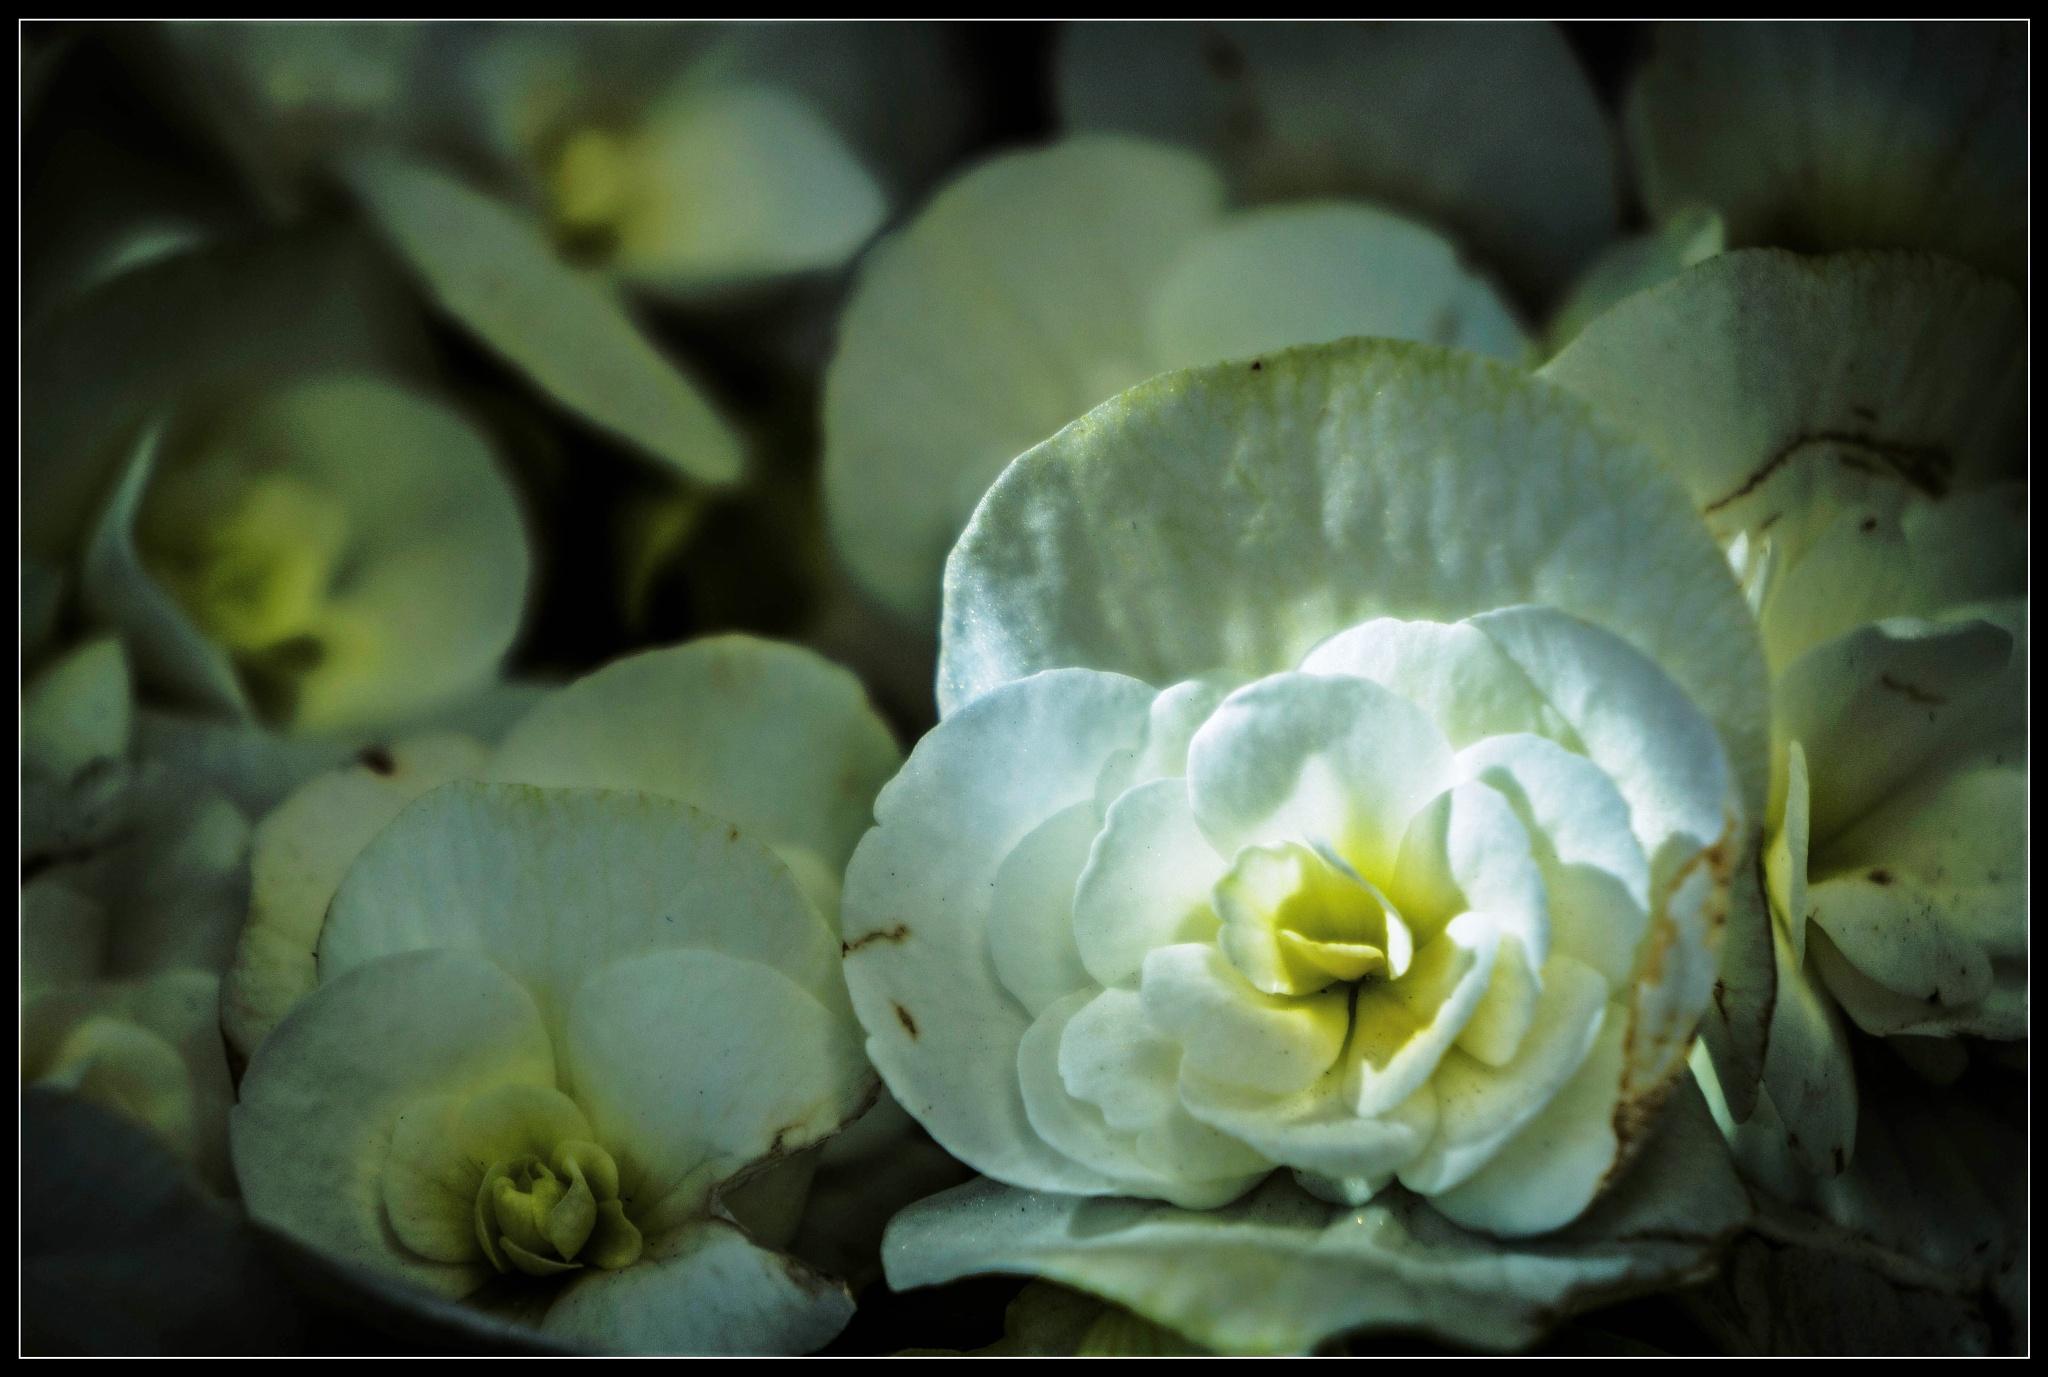 Begonia by Elias Papageorgiou (Drifter Dfr)